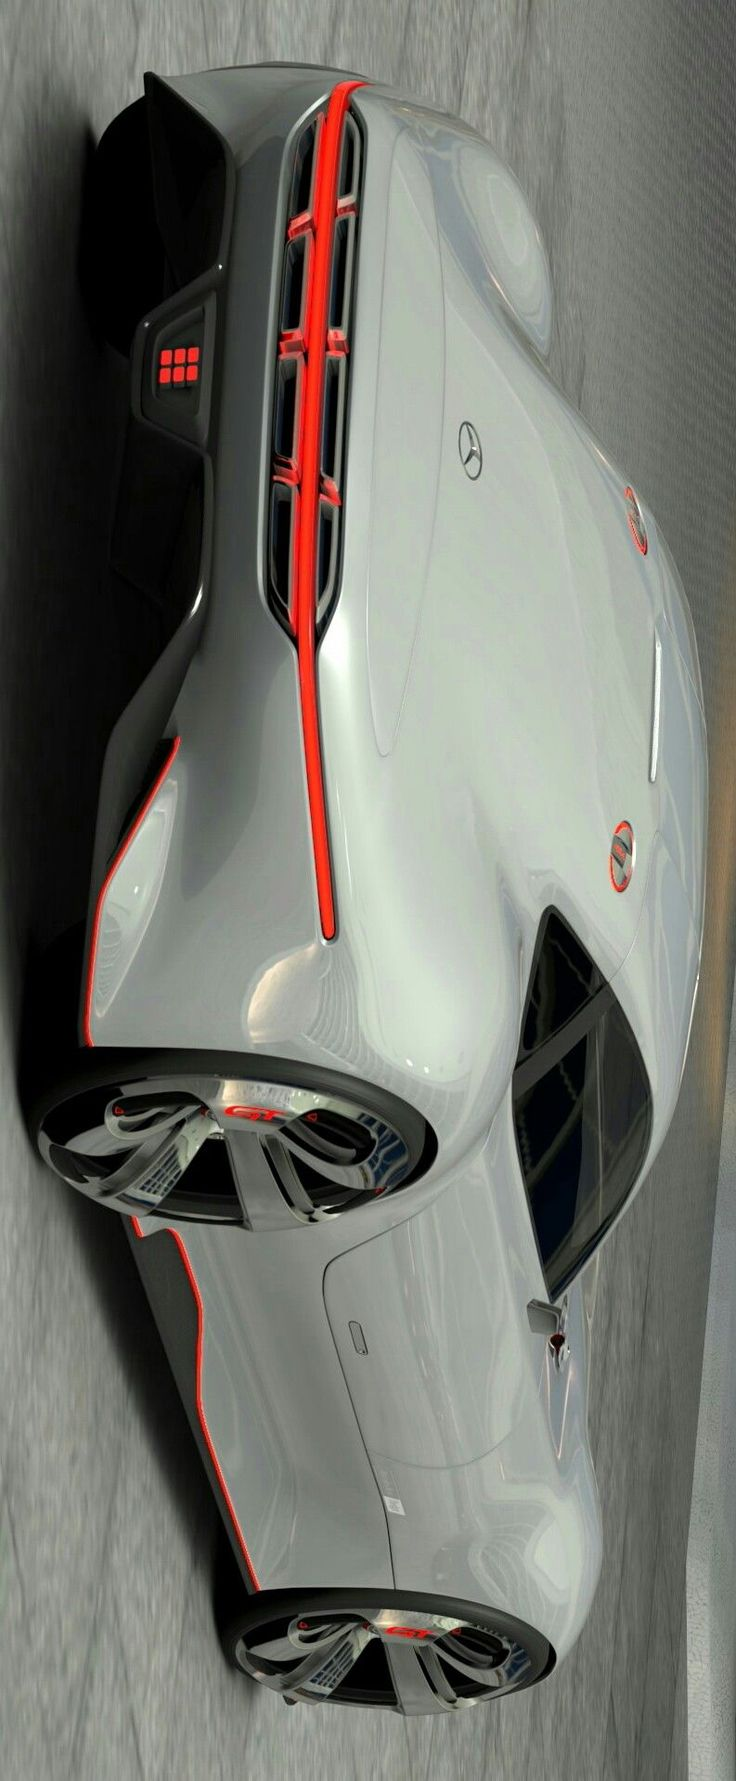 Mercedes-Benz AMG Vision Gran Turismo by Levon